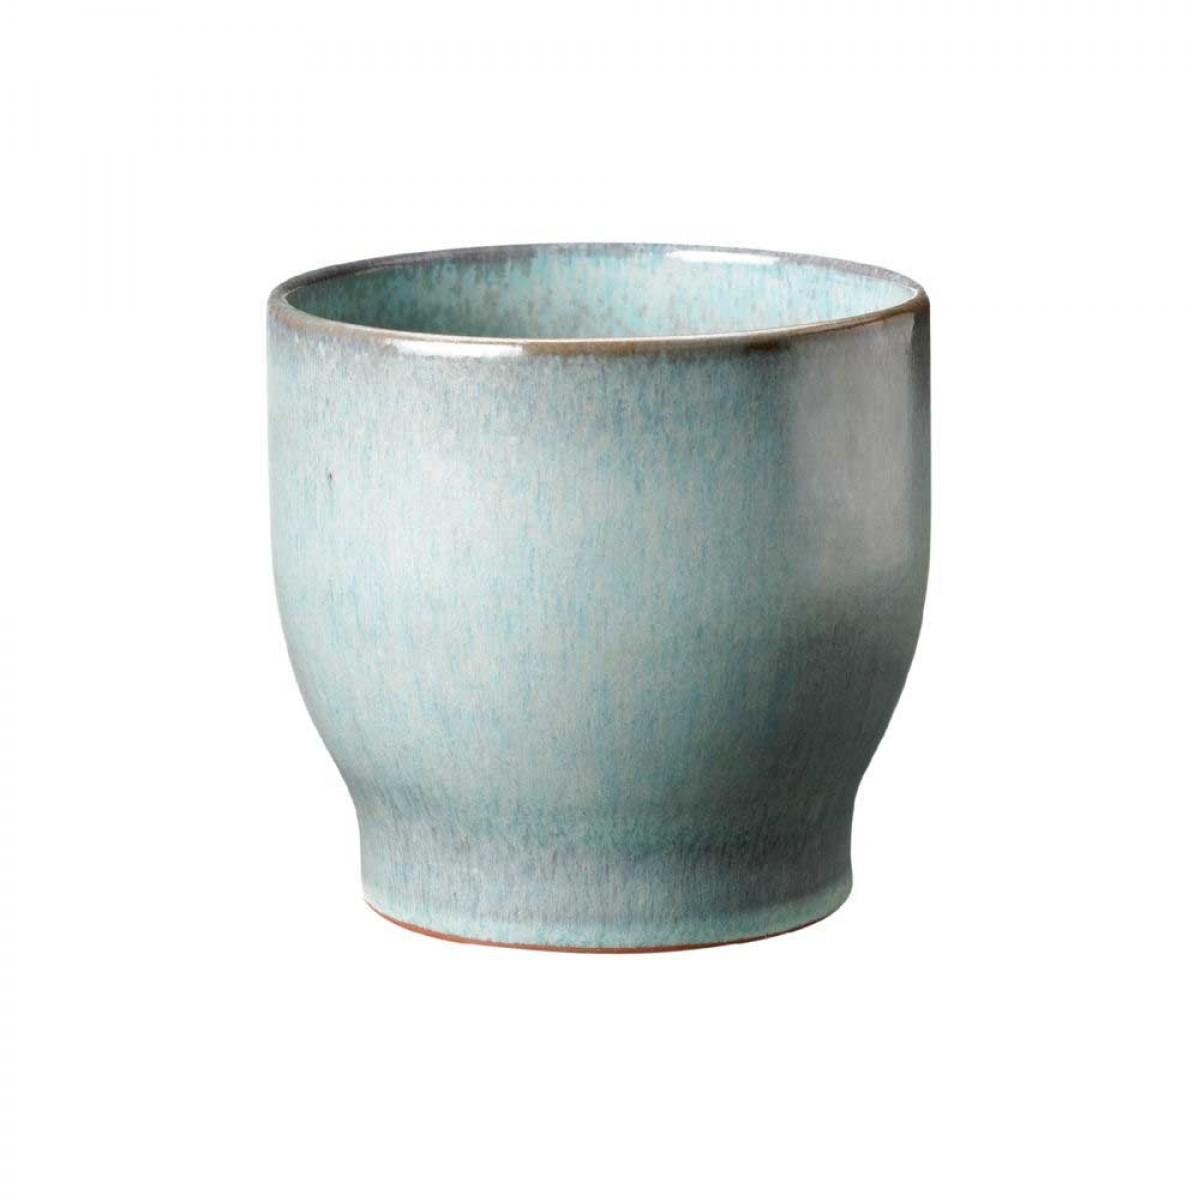 KNABSTRUP Keramik Urtepotteskjuler, soft mint, Ø14,5 cm